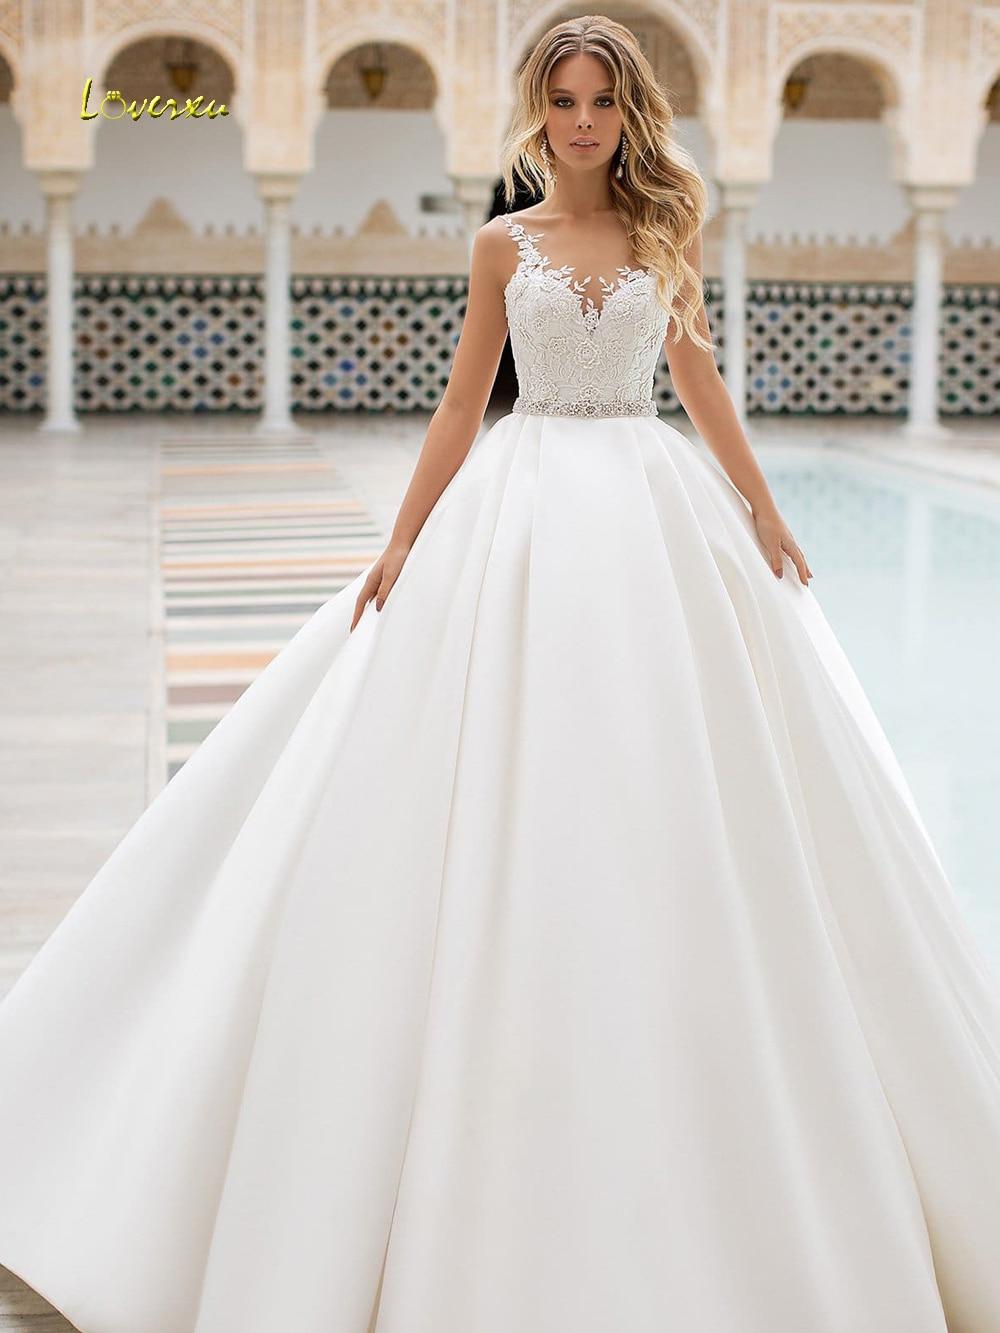 b49710bbb2f71 Loverxu Sexy Backless Appliques Vintage Wedding Dresses 2019 Elegant Sashes  Beaded Matte Satin Court ...